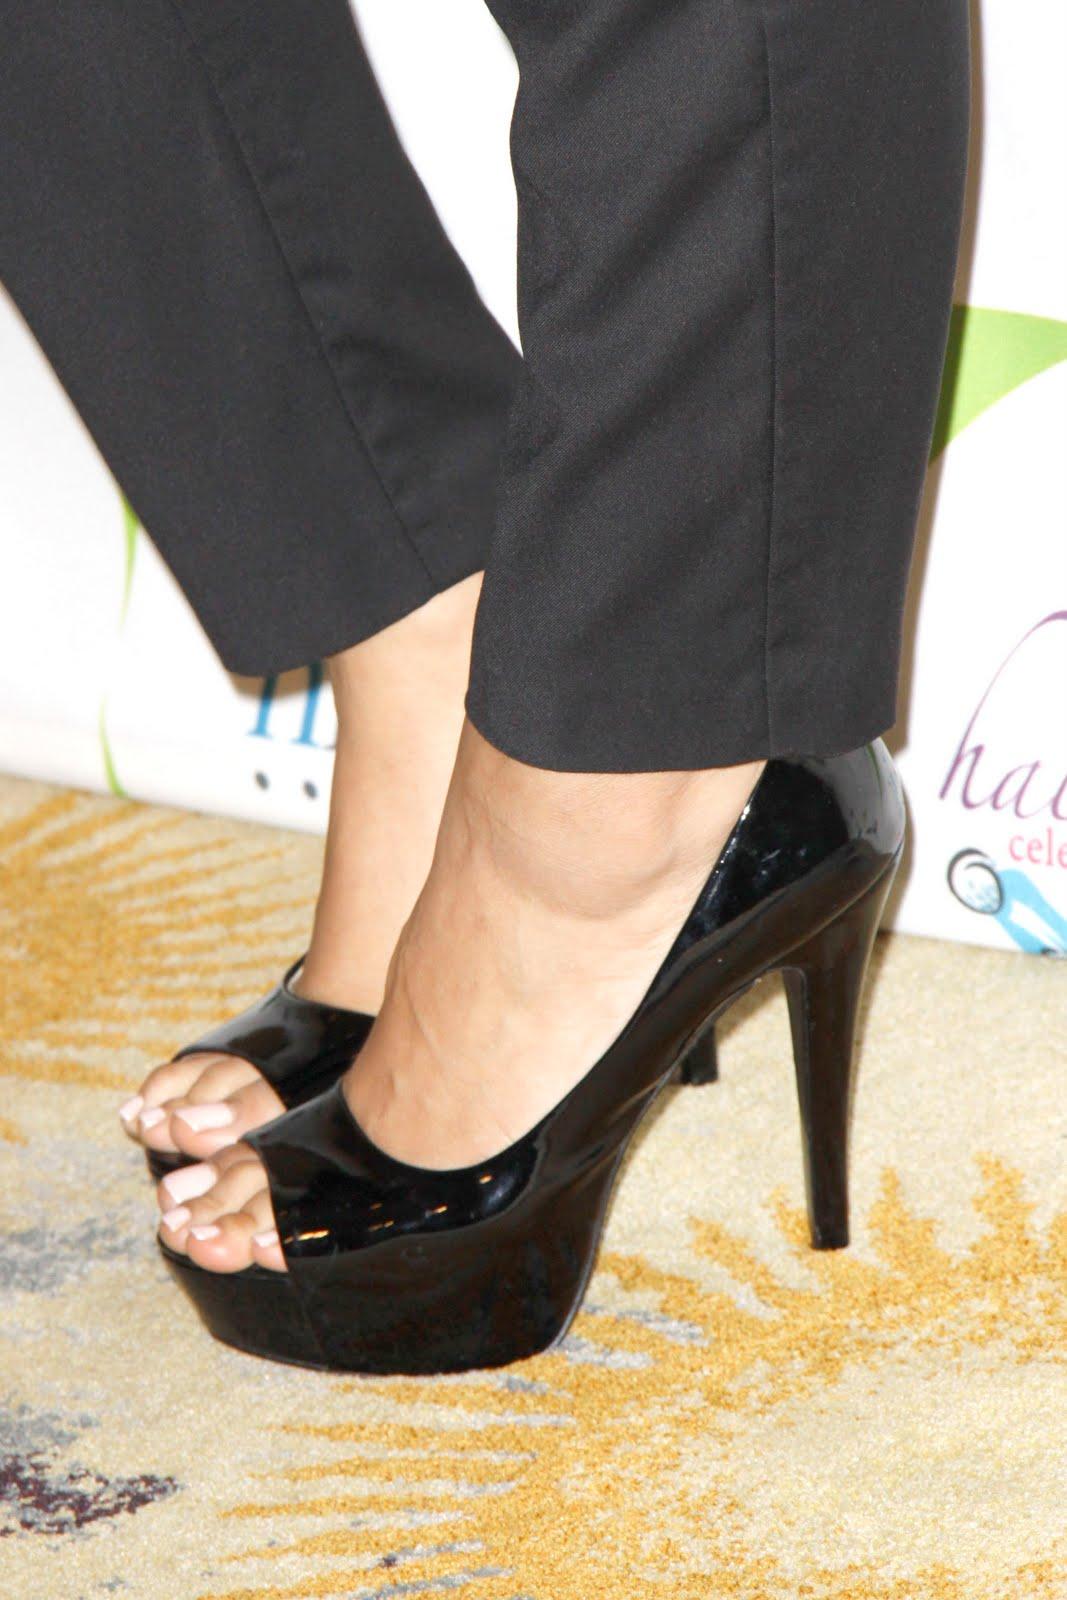 http://4.bp.blogspot.com/_UaLWp72nij4/S_RLyiK_4CI/AAAAAAAAL2k/w_t0pbQmWV8/s1600/leona-lewis-feet-5.jpg